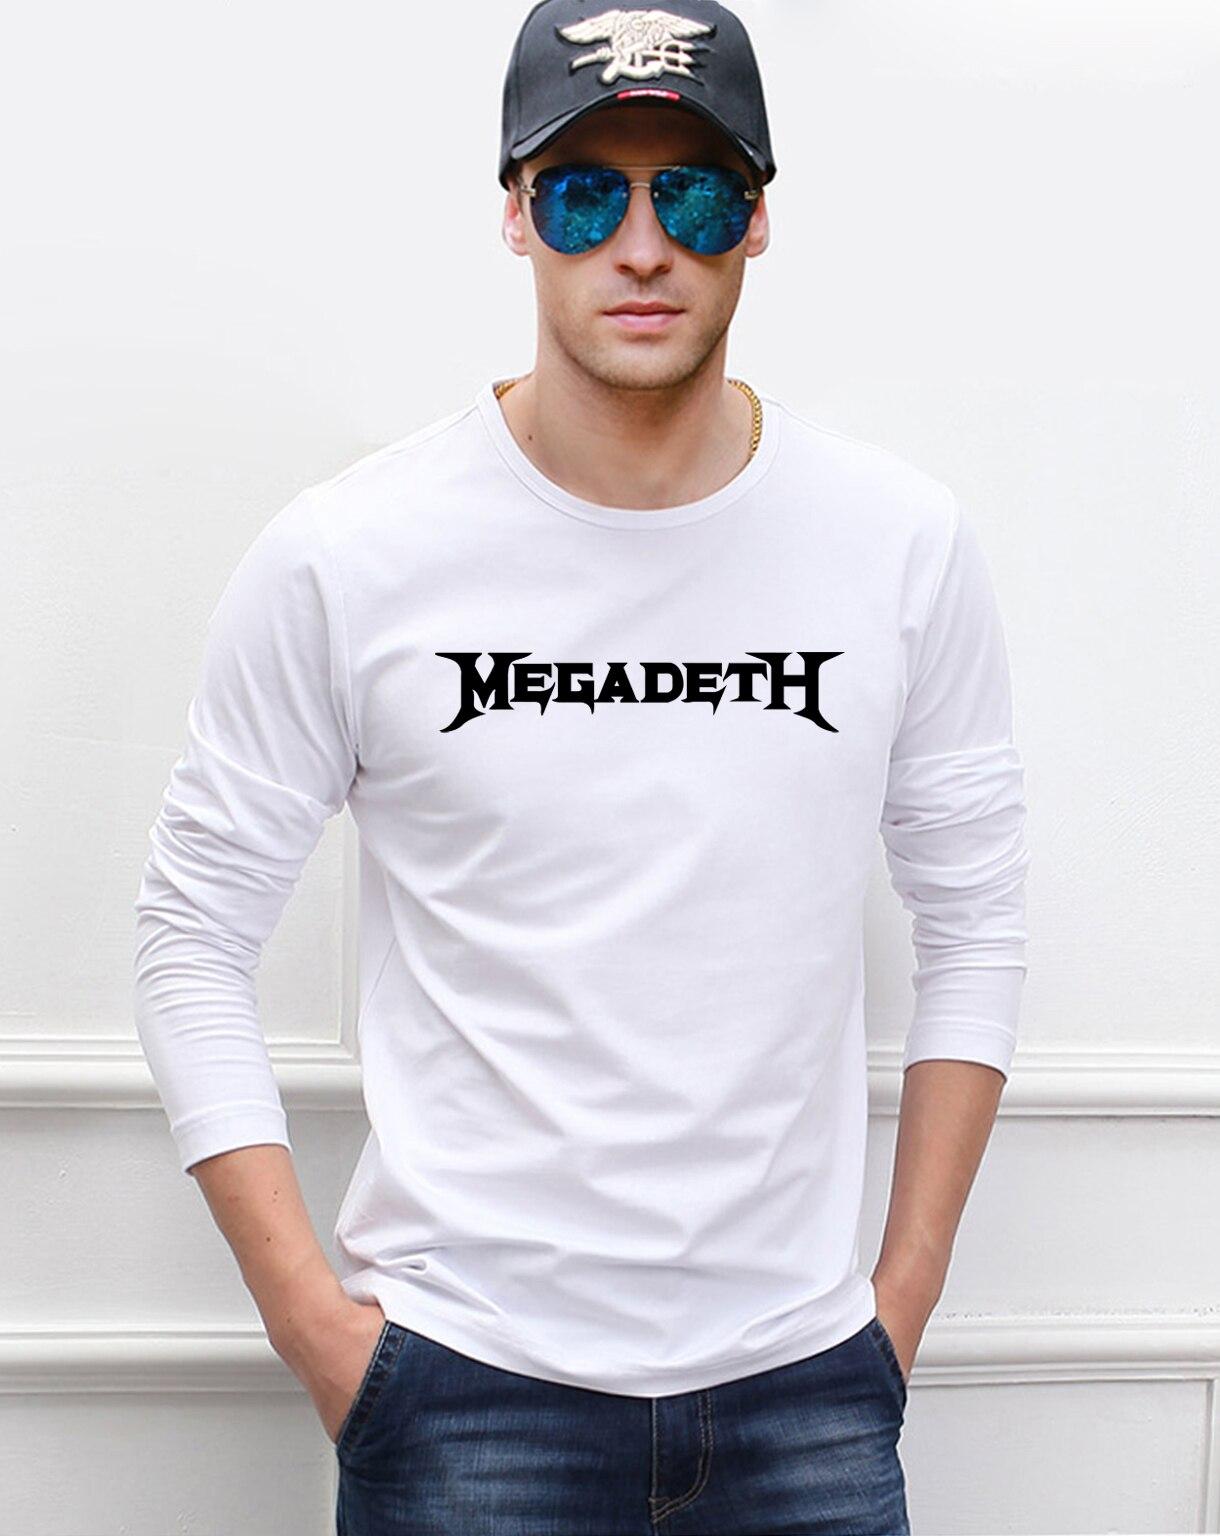 Band  men long sleeve t-shirts 2019 spring new 100% cotton hip hop men t shirt fitness man top tees Camisetas Masculina